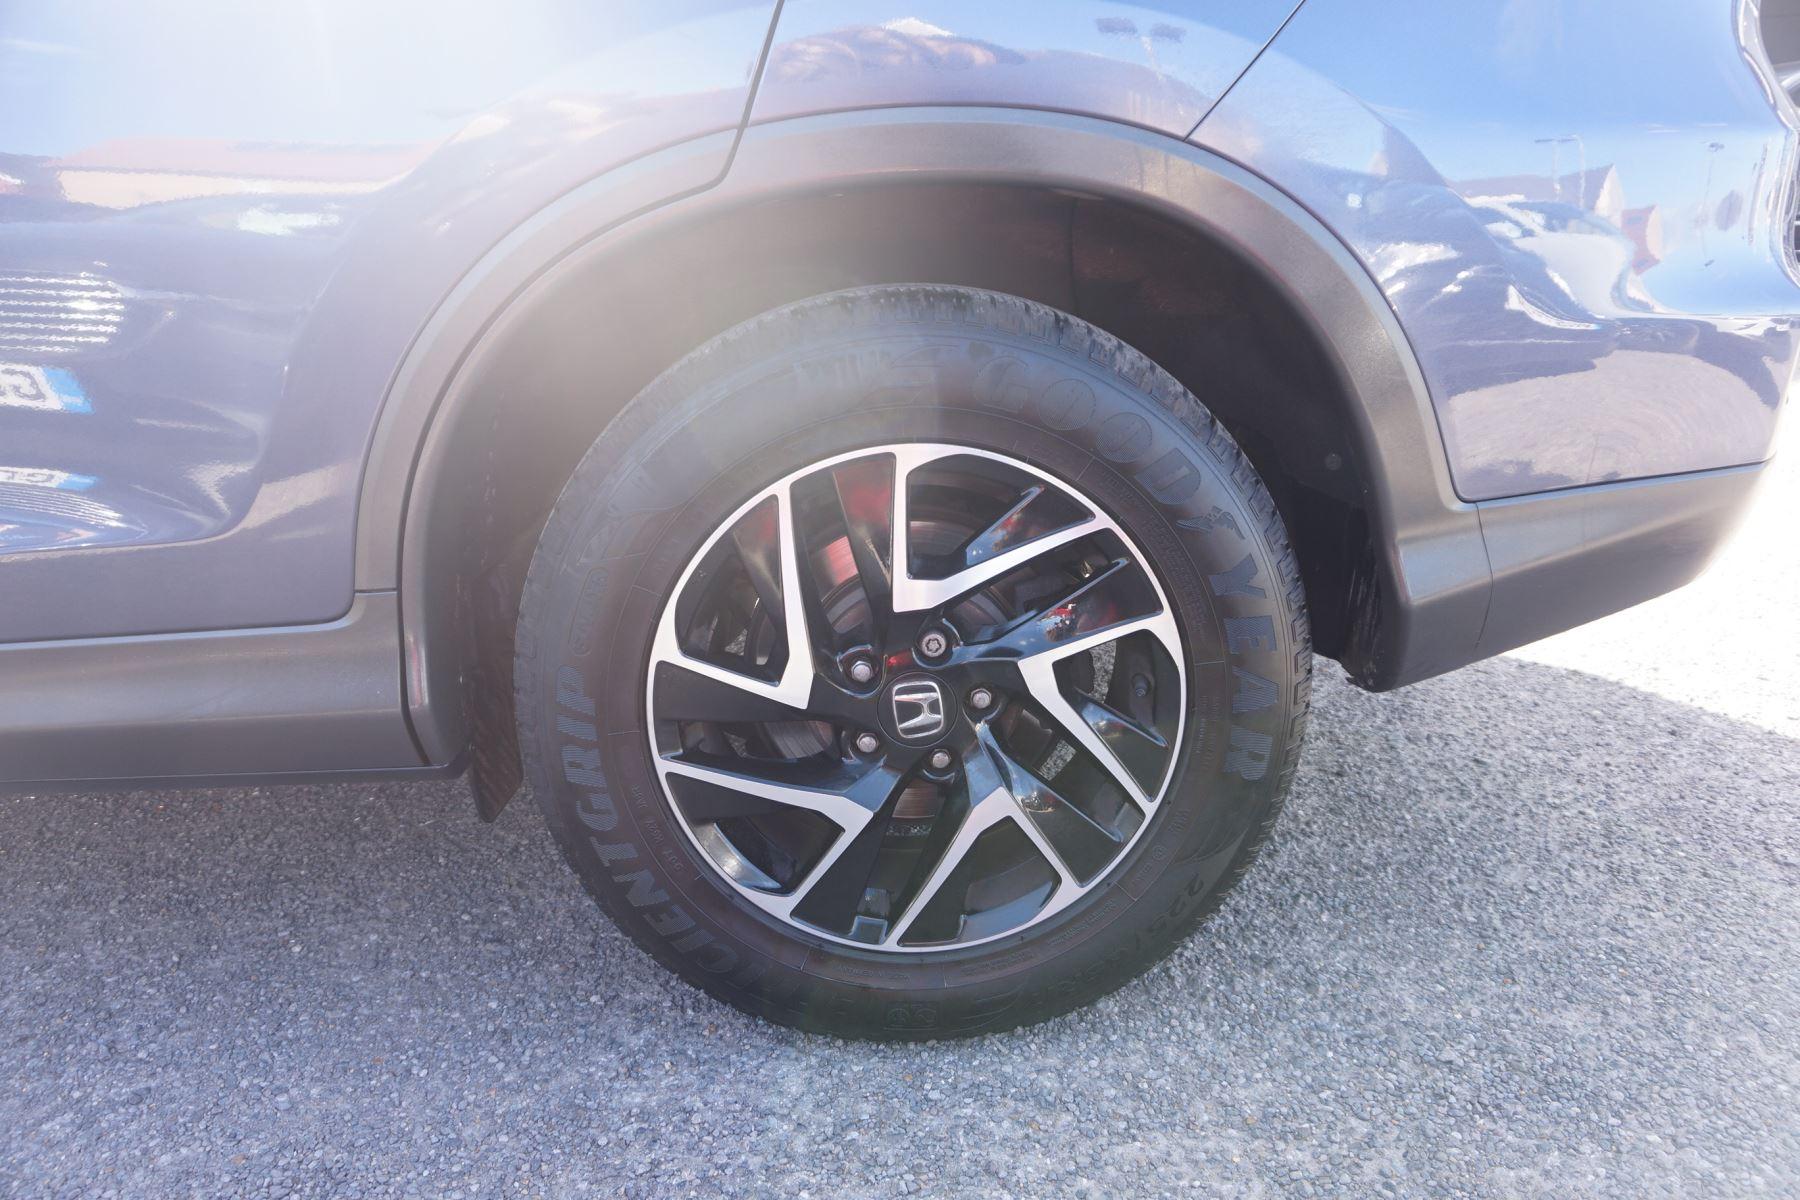 Honda CR-V 1.6 i-DTEC 160 SE Plus 5dr [Nav] 4WD image 7